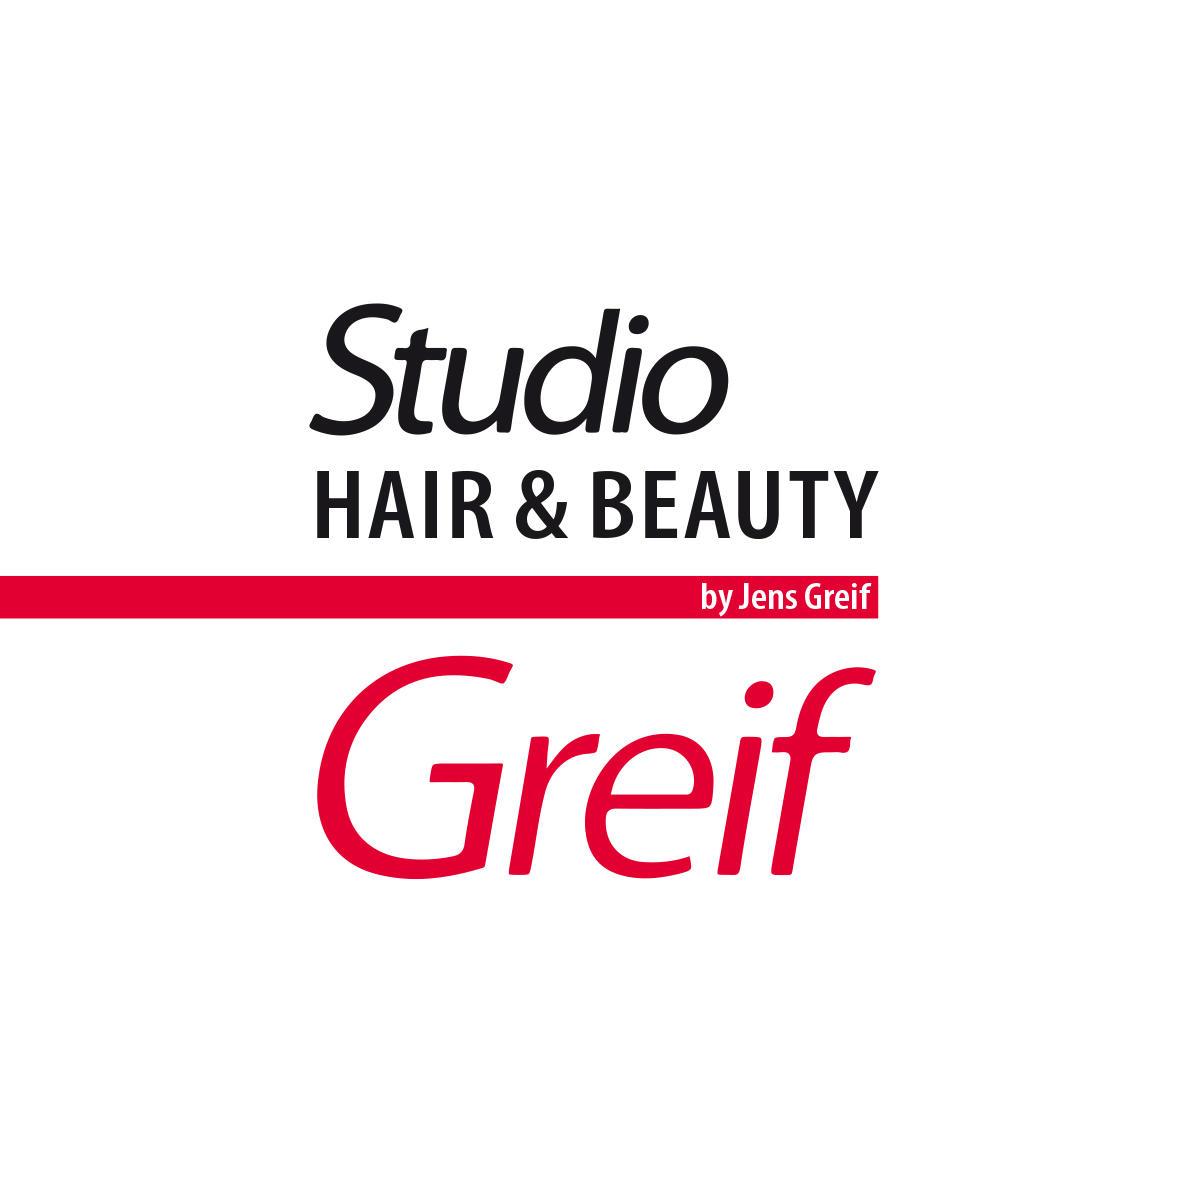 Bild zu Studio Greif Friseur, Kosmetik, Wellness in Großröhrsdorf in der Oberlausitz